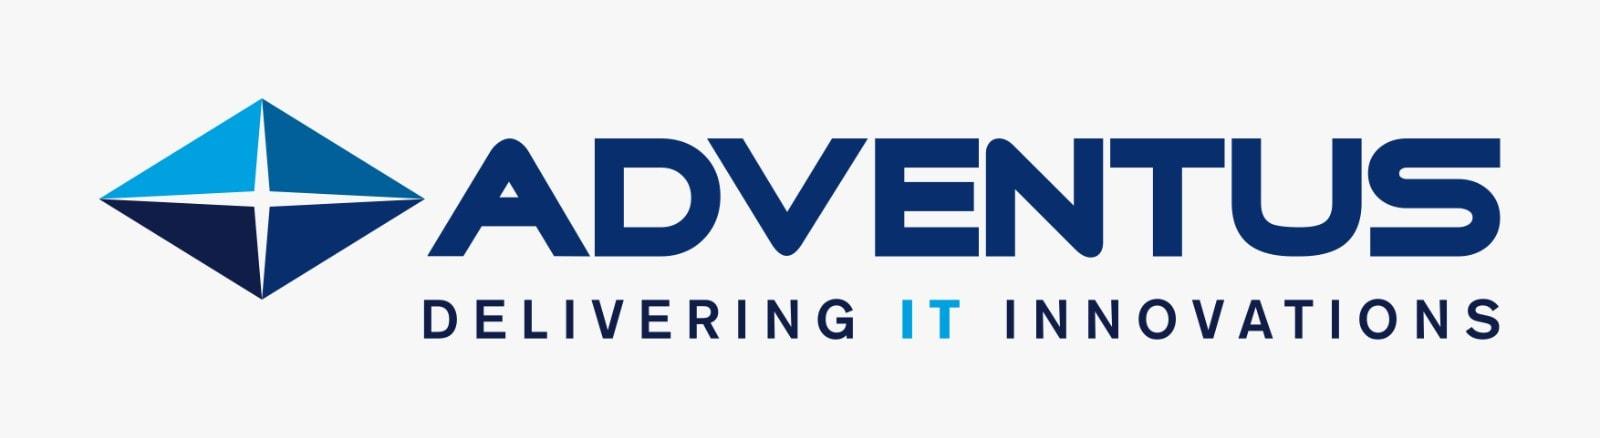 Adventus Top IT Compane Singapore